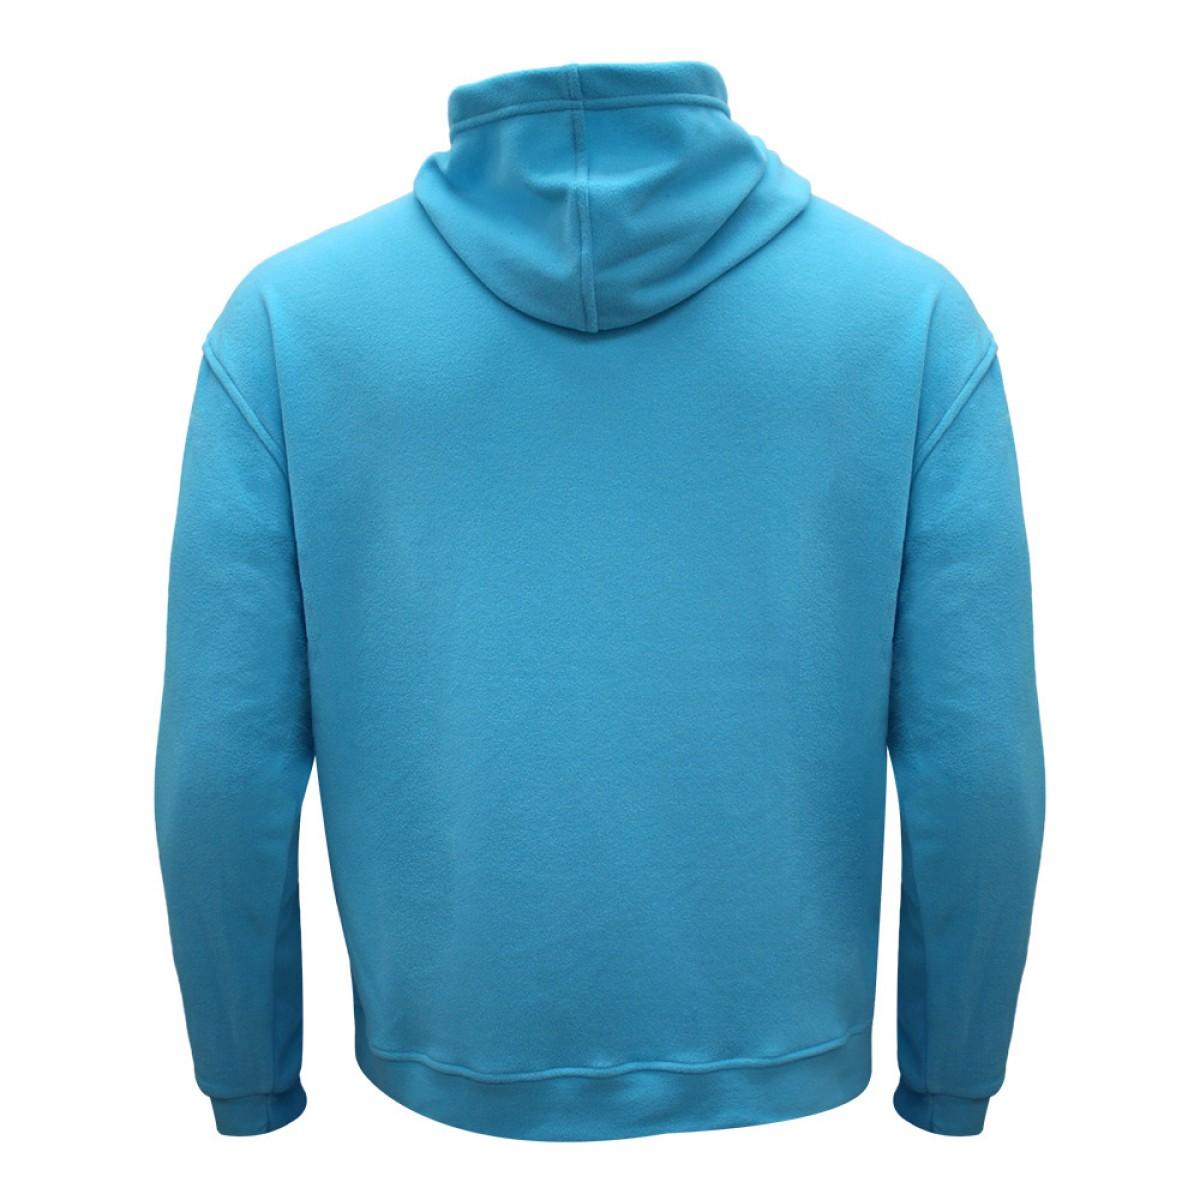 men-fleece-hoodie-jacketkfh95714-5b